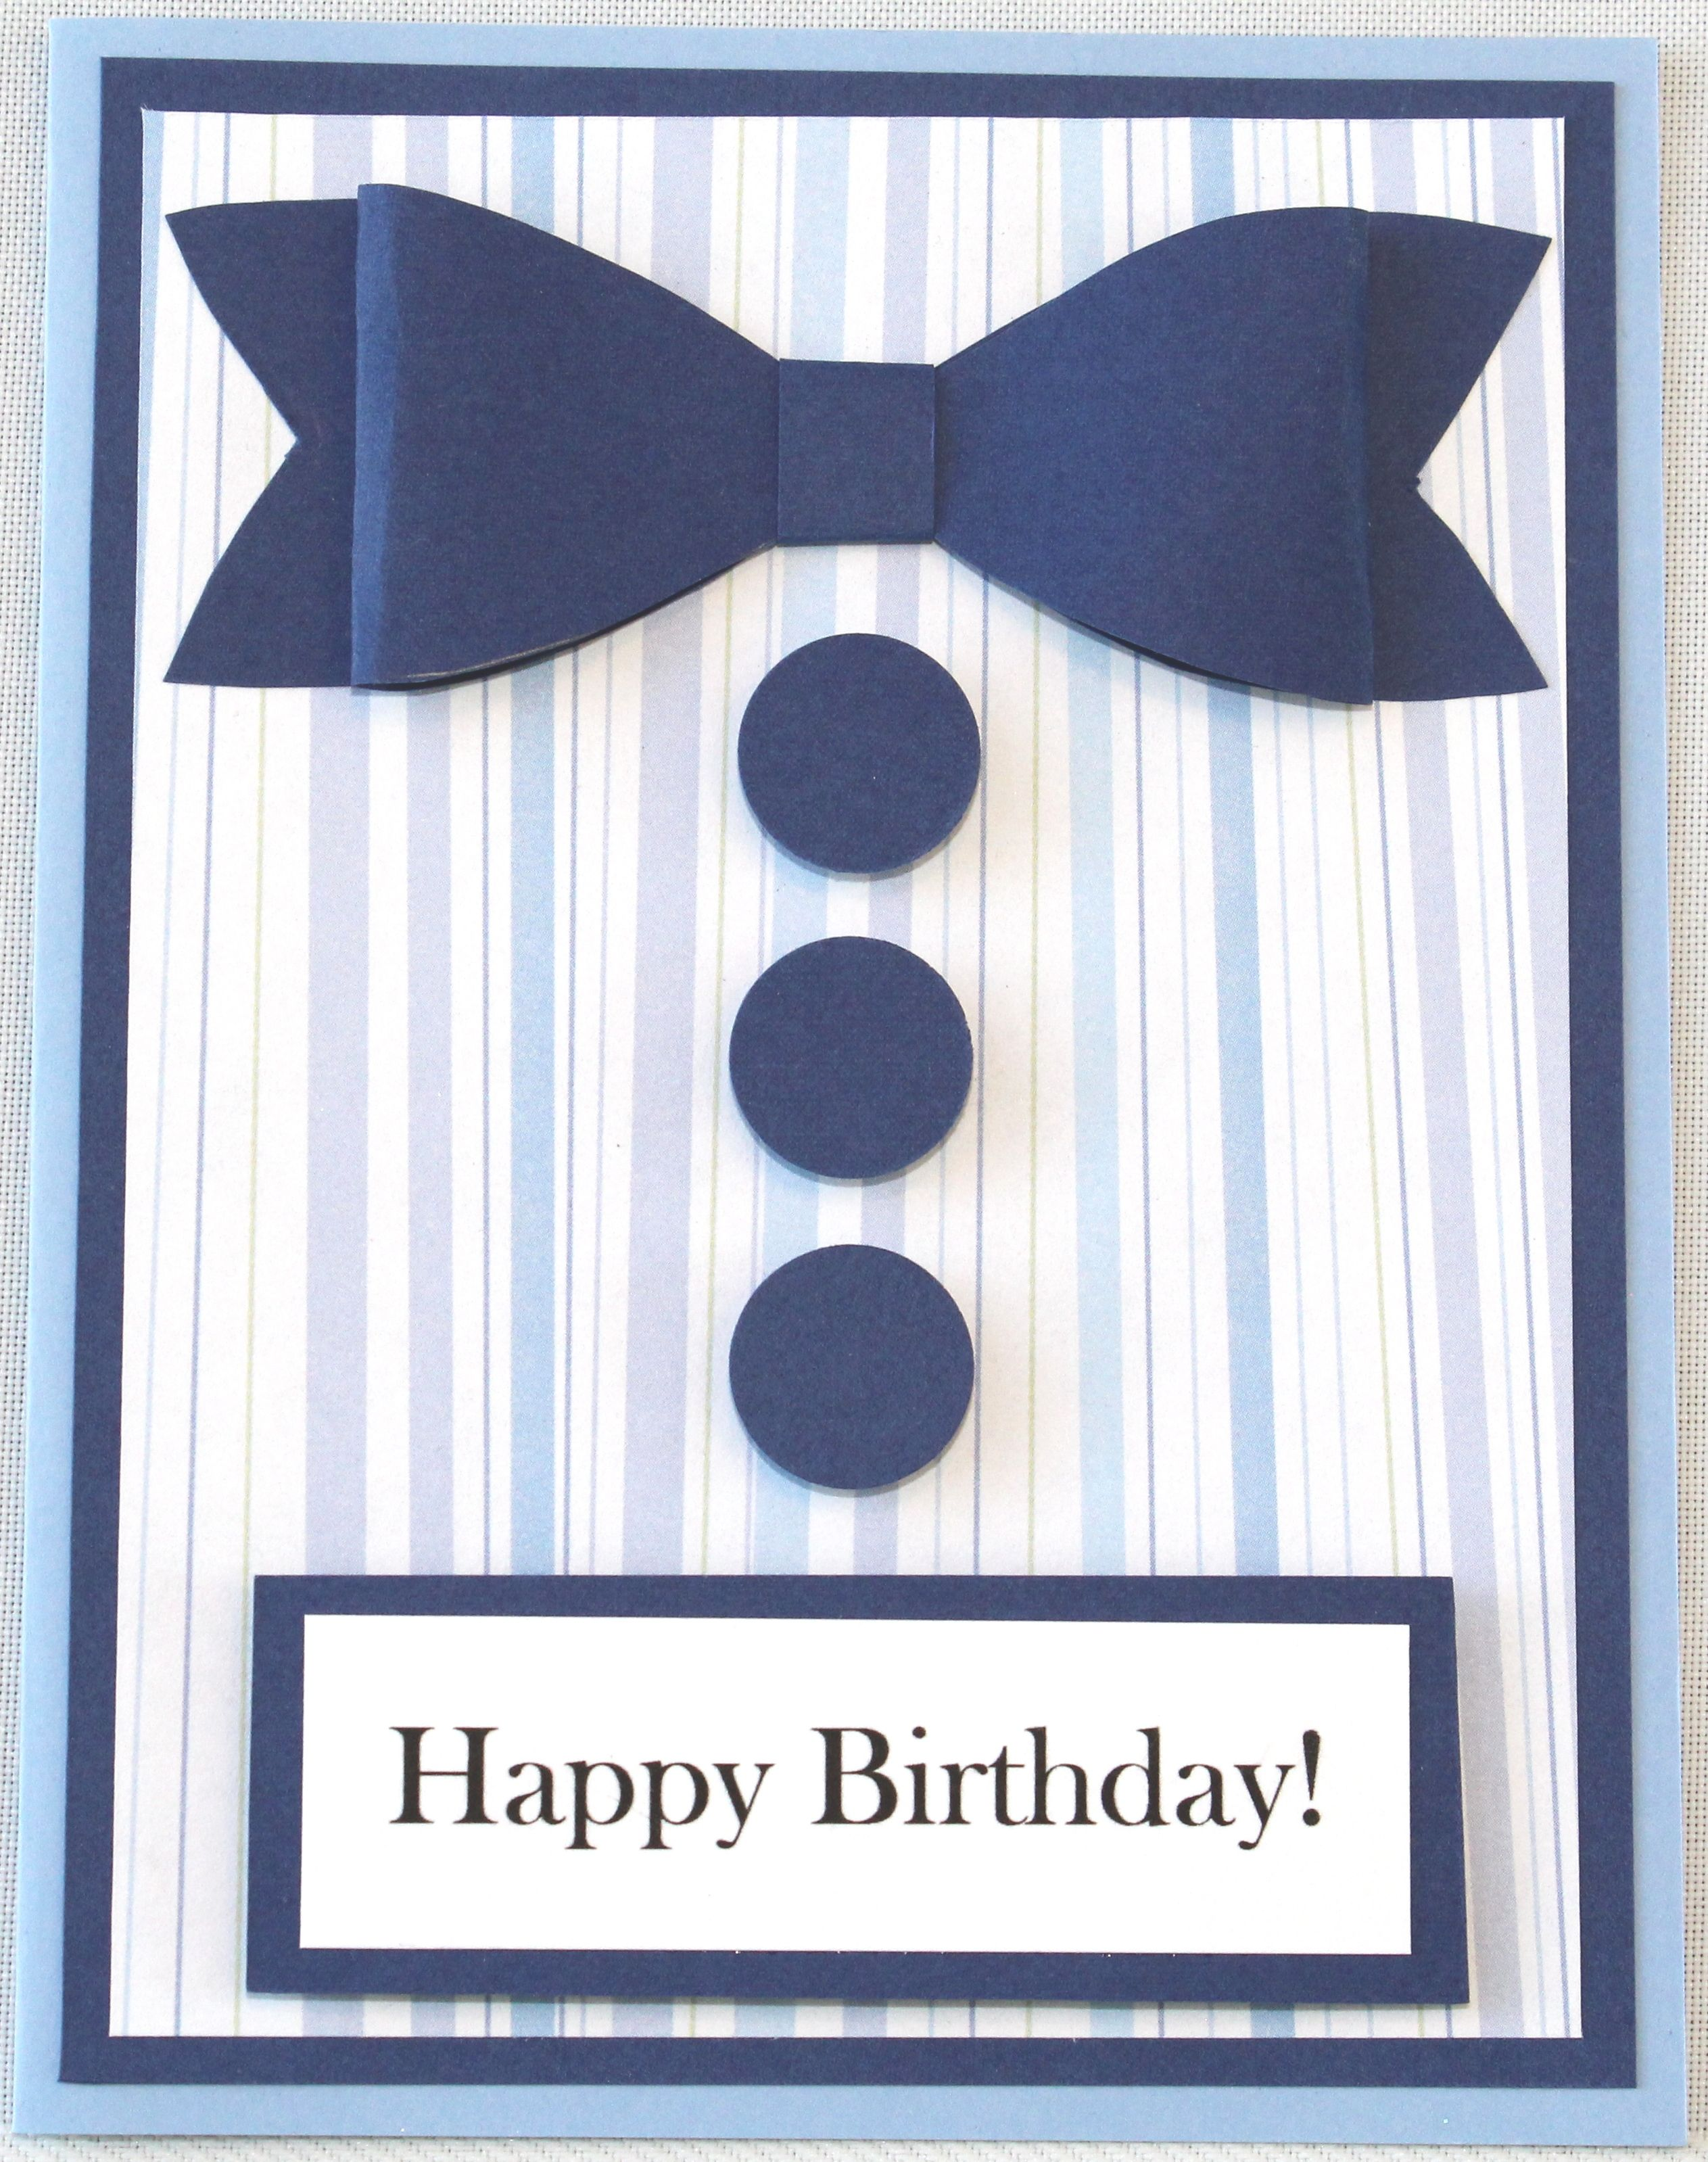 Happy Birthday Male Handmade 3 D Blue Striped Shirt With Navy Etsy Happy Birthday Man Happy Birthday Cards Diy Happy Birthday Card Design